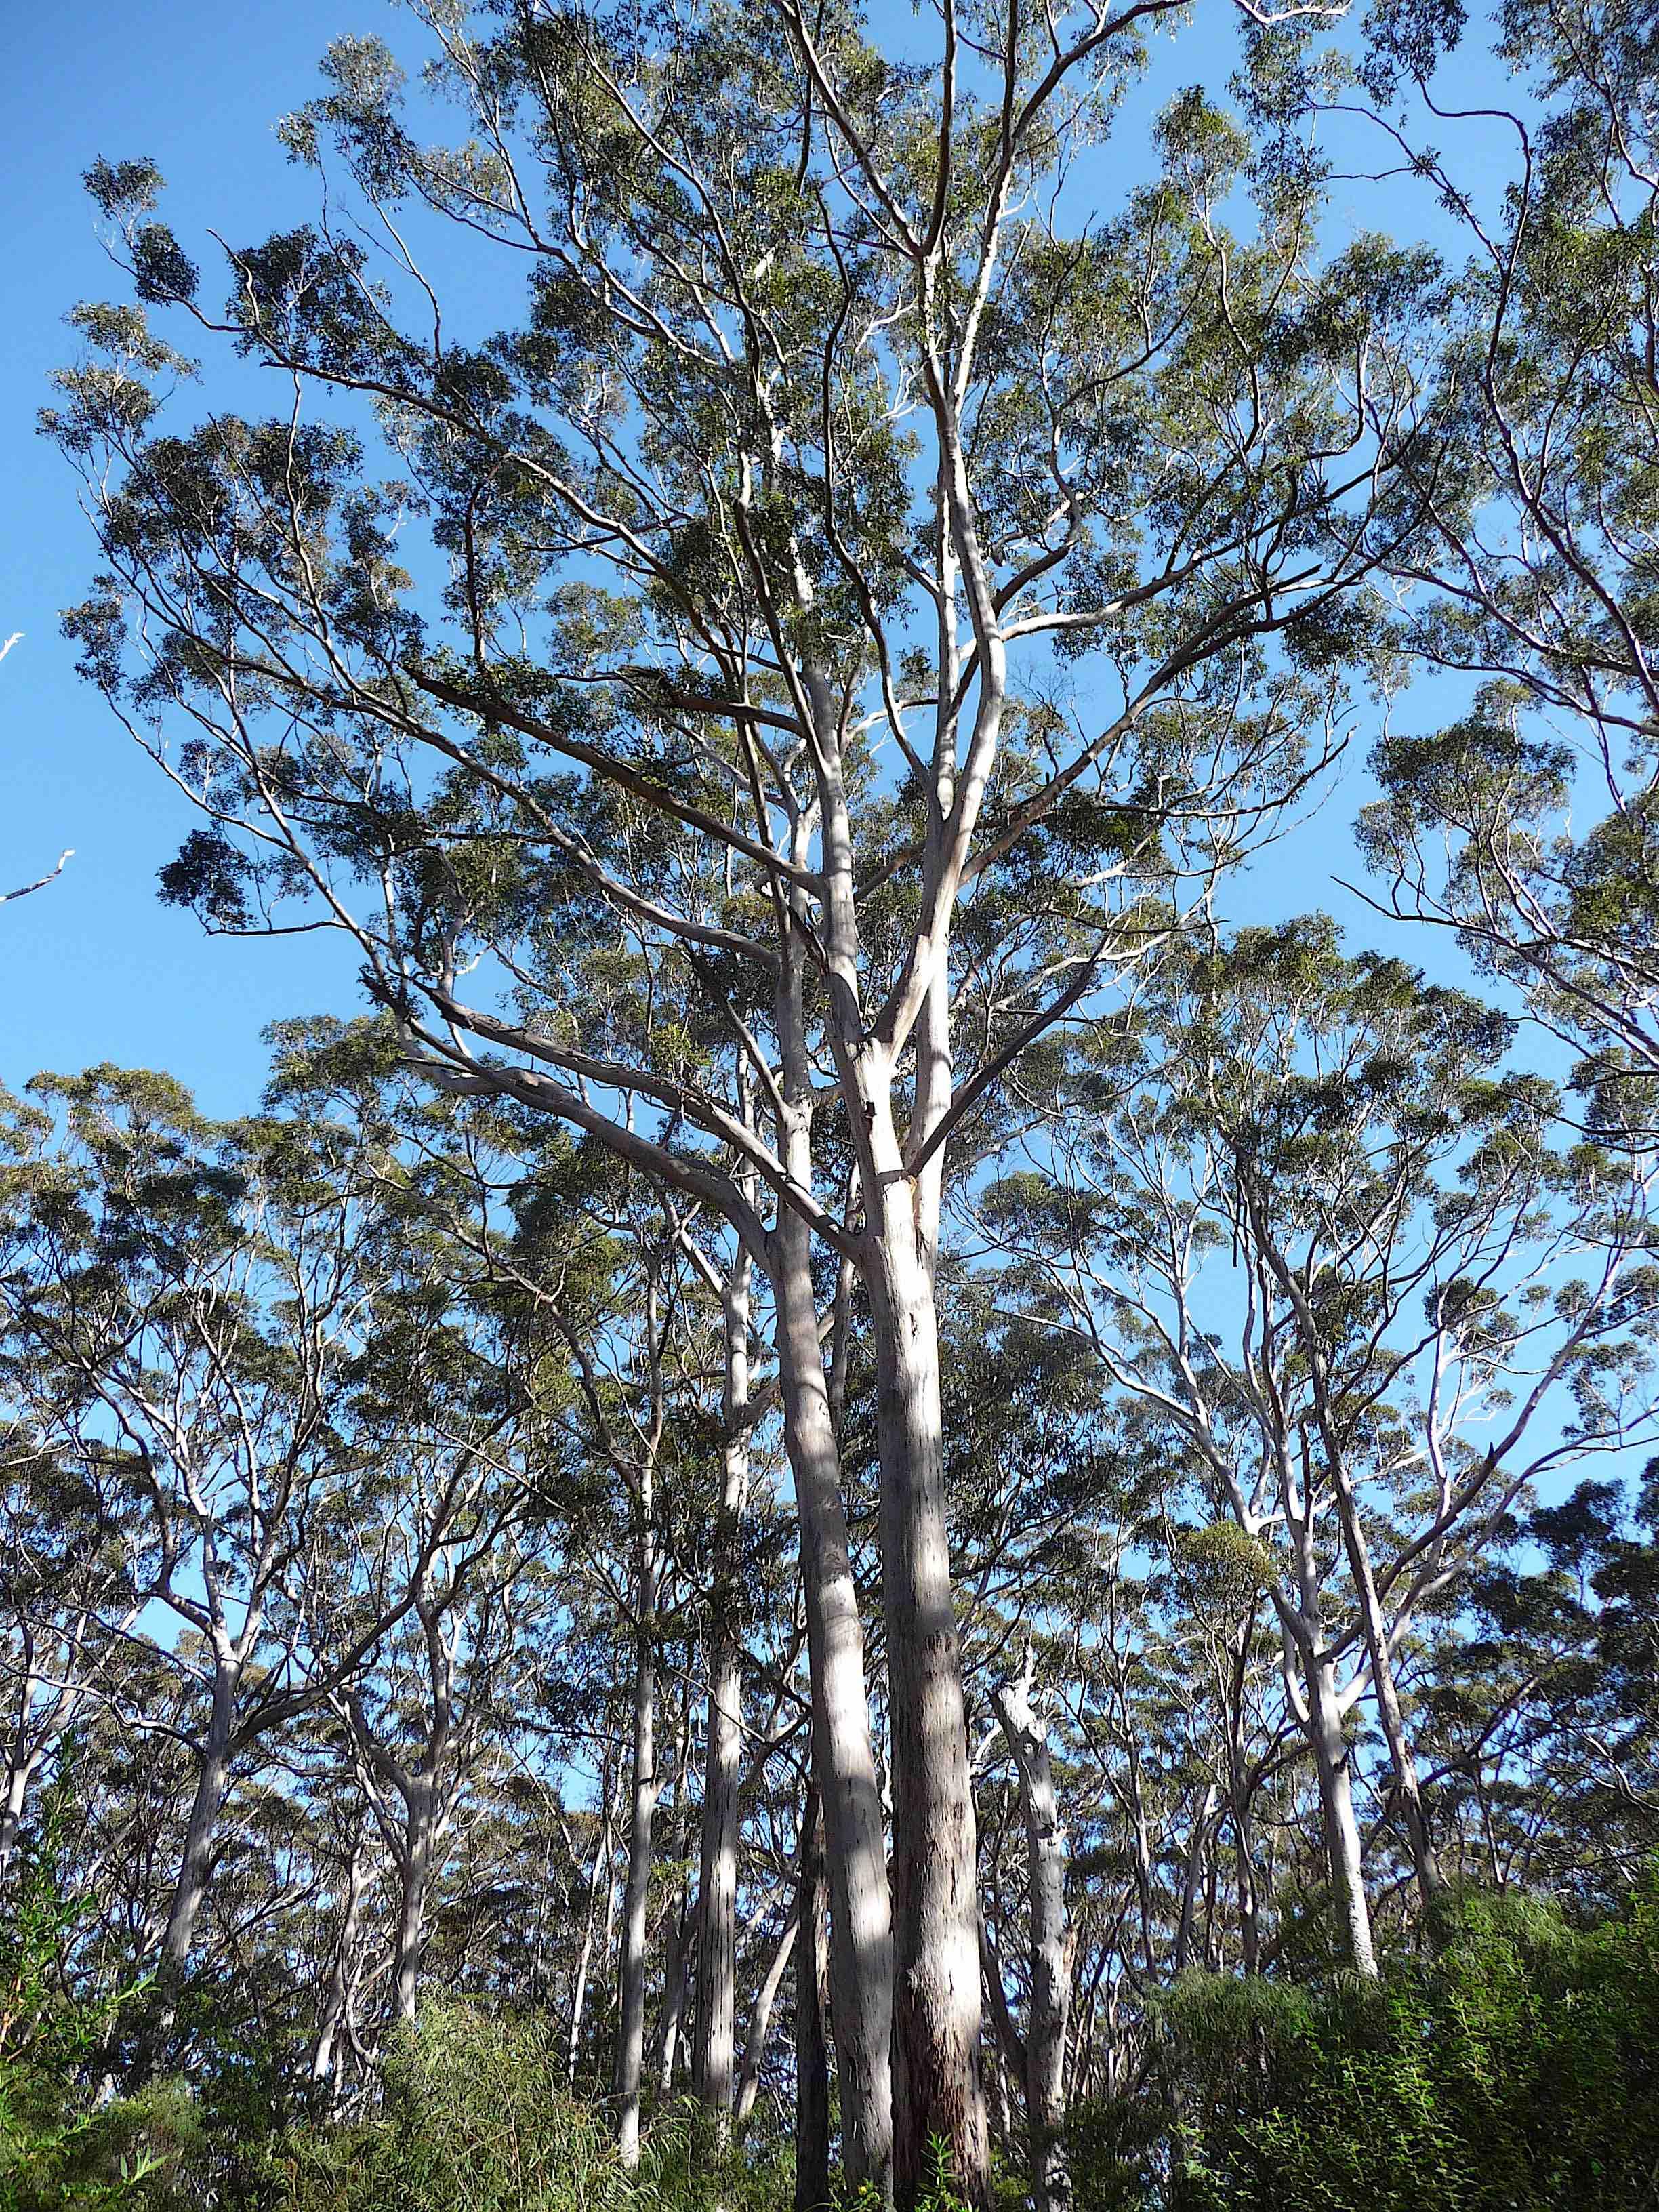 3.Karri forest